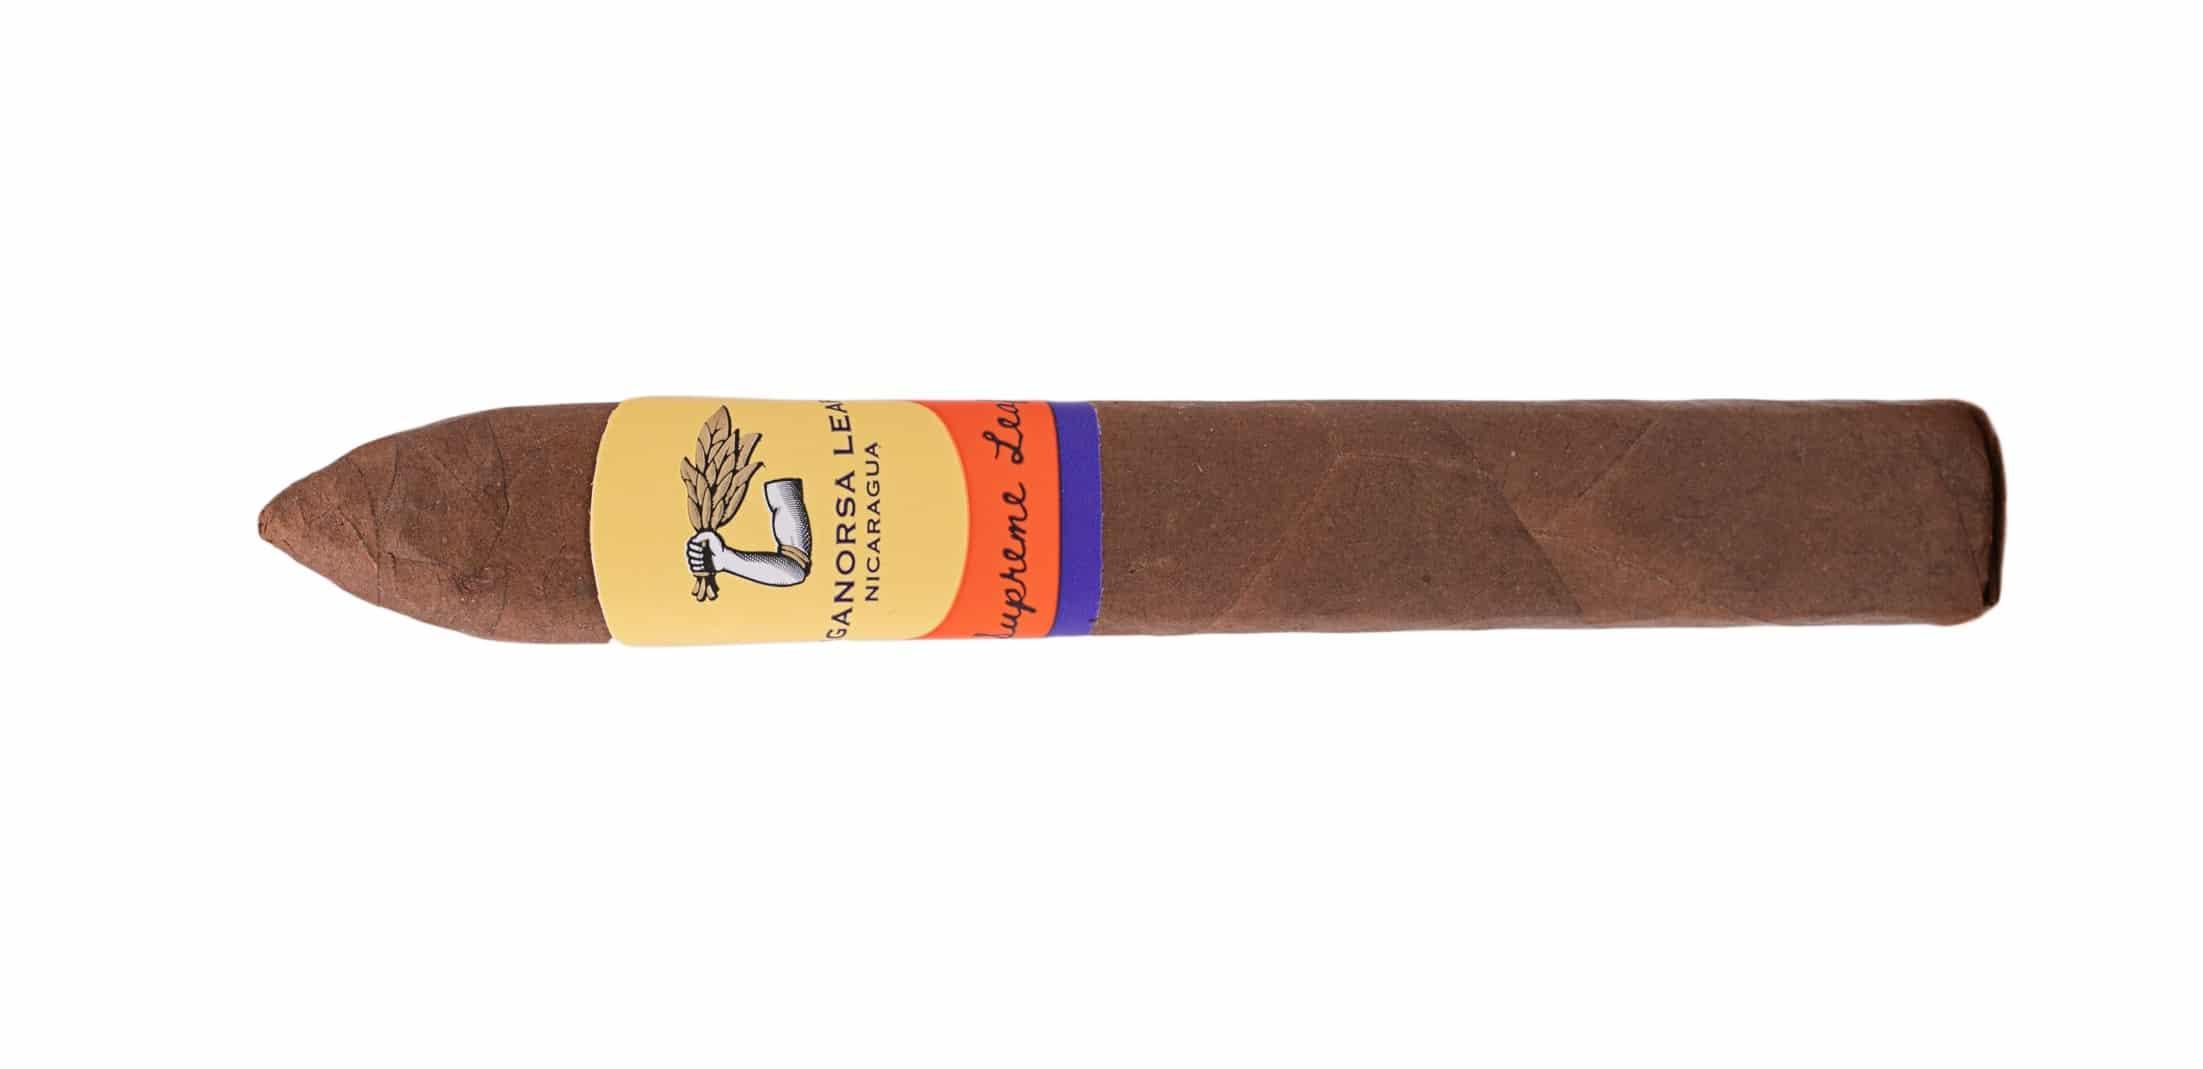 Aganorsa Leaf Adding Torpedo to Supreme Leaf - Cigar News